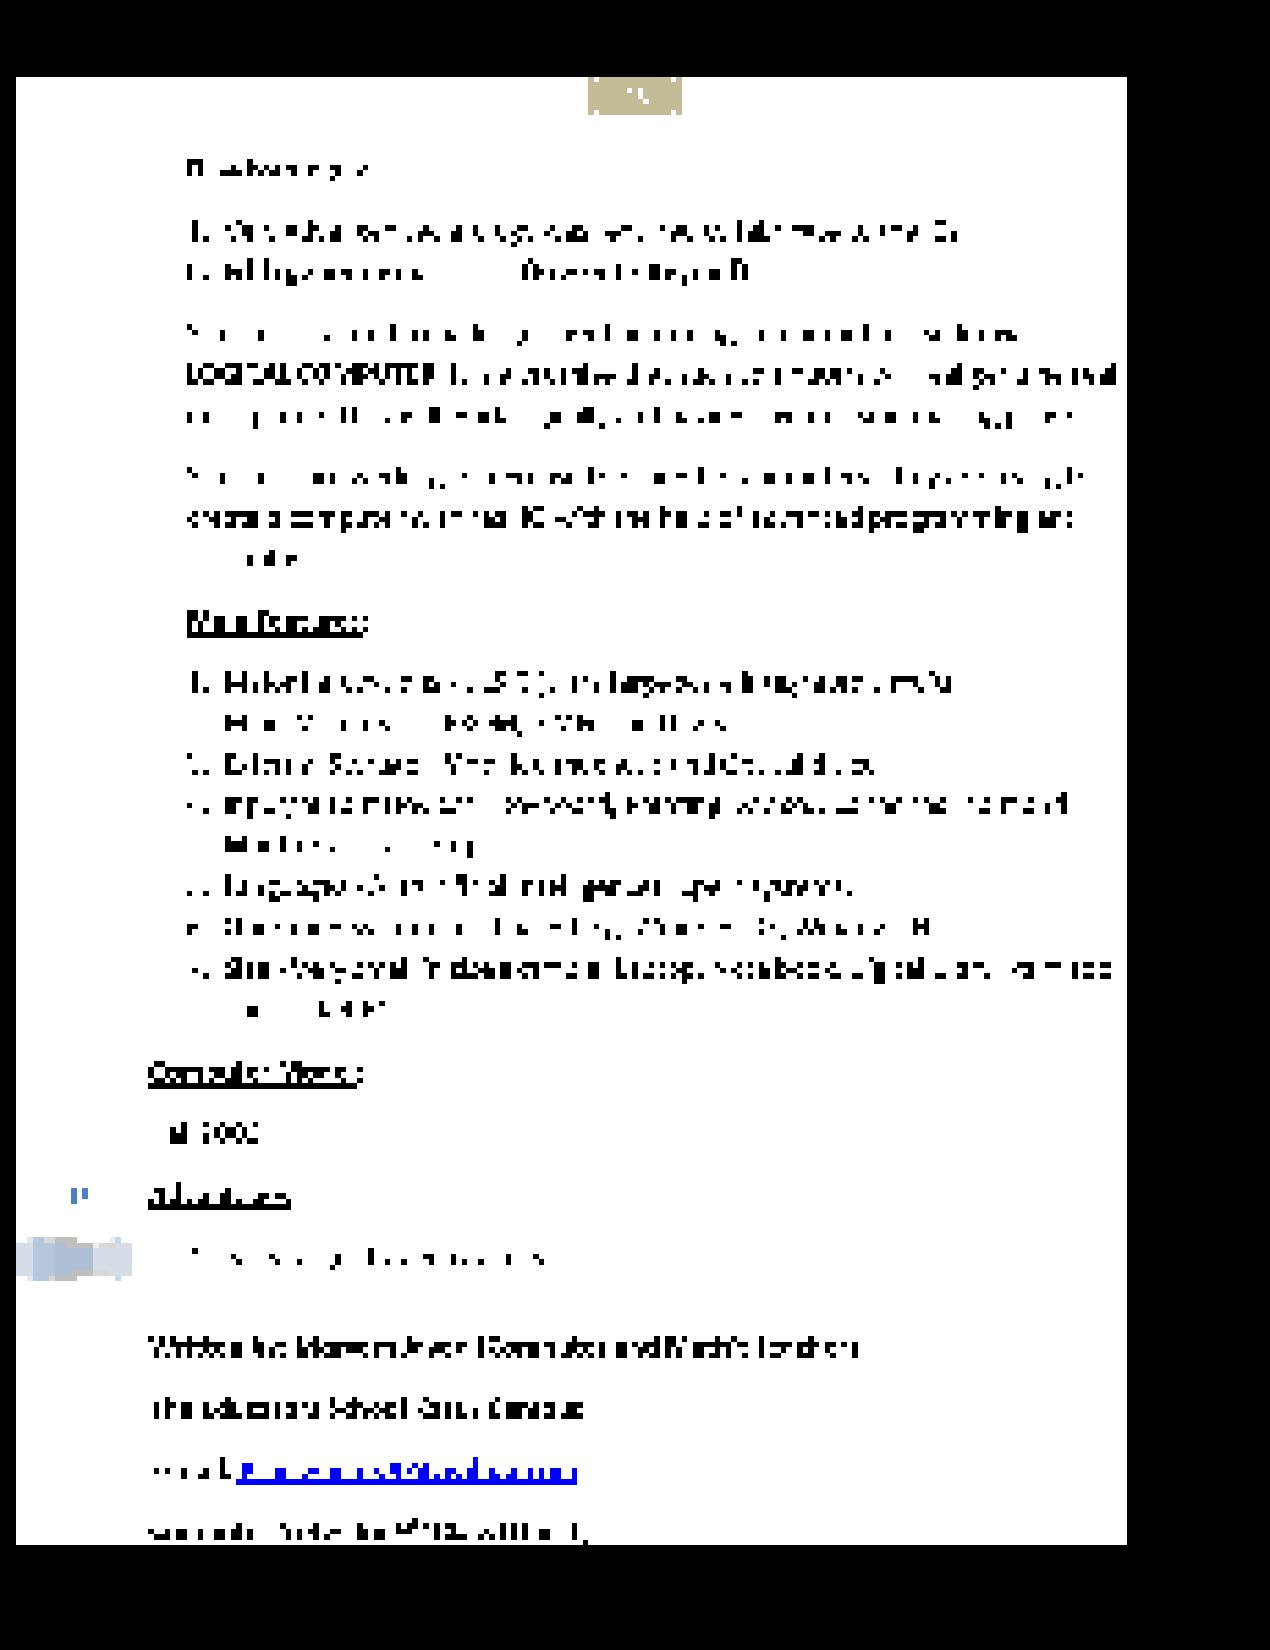 Computer notes for class 9 | Homework Writing Service pzpaperlpkk